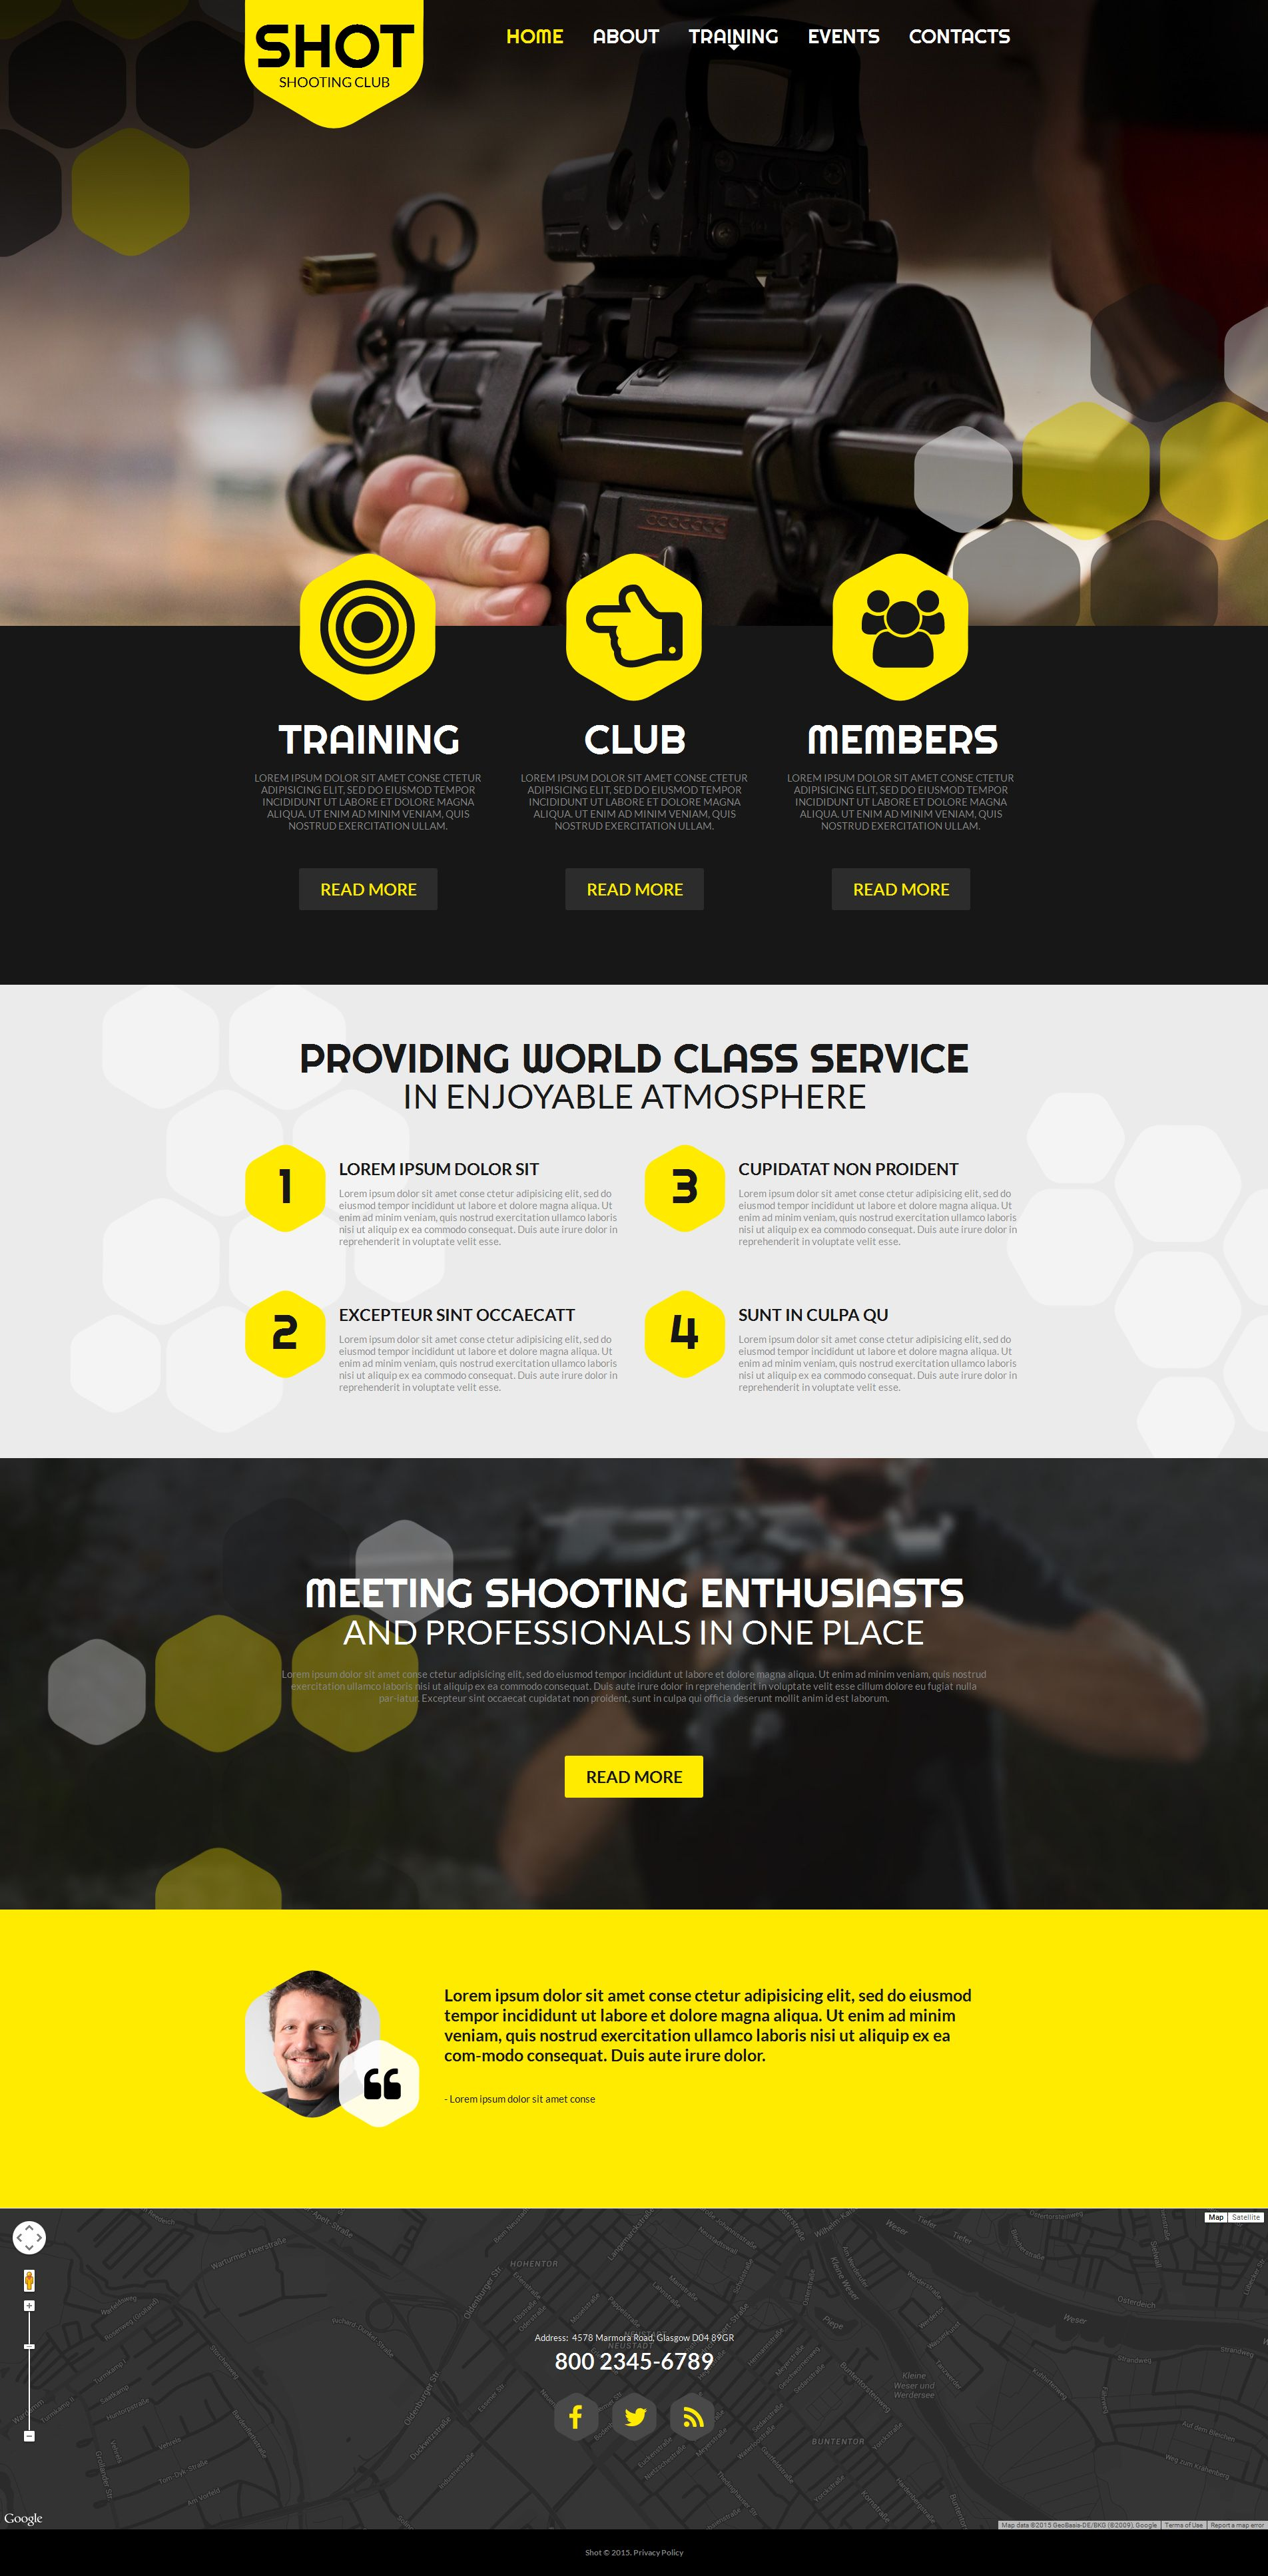 Szablon Moto CMS HTML #55322 na temat: strzelanie